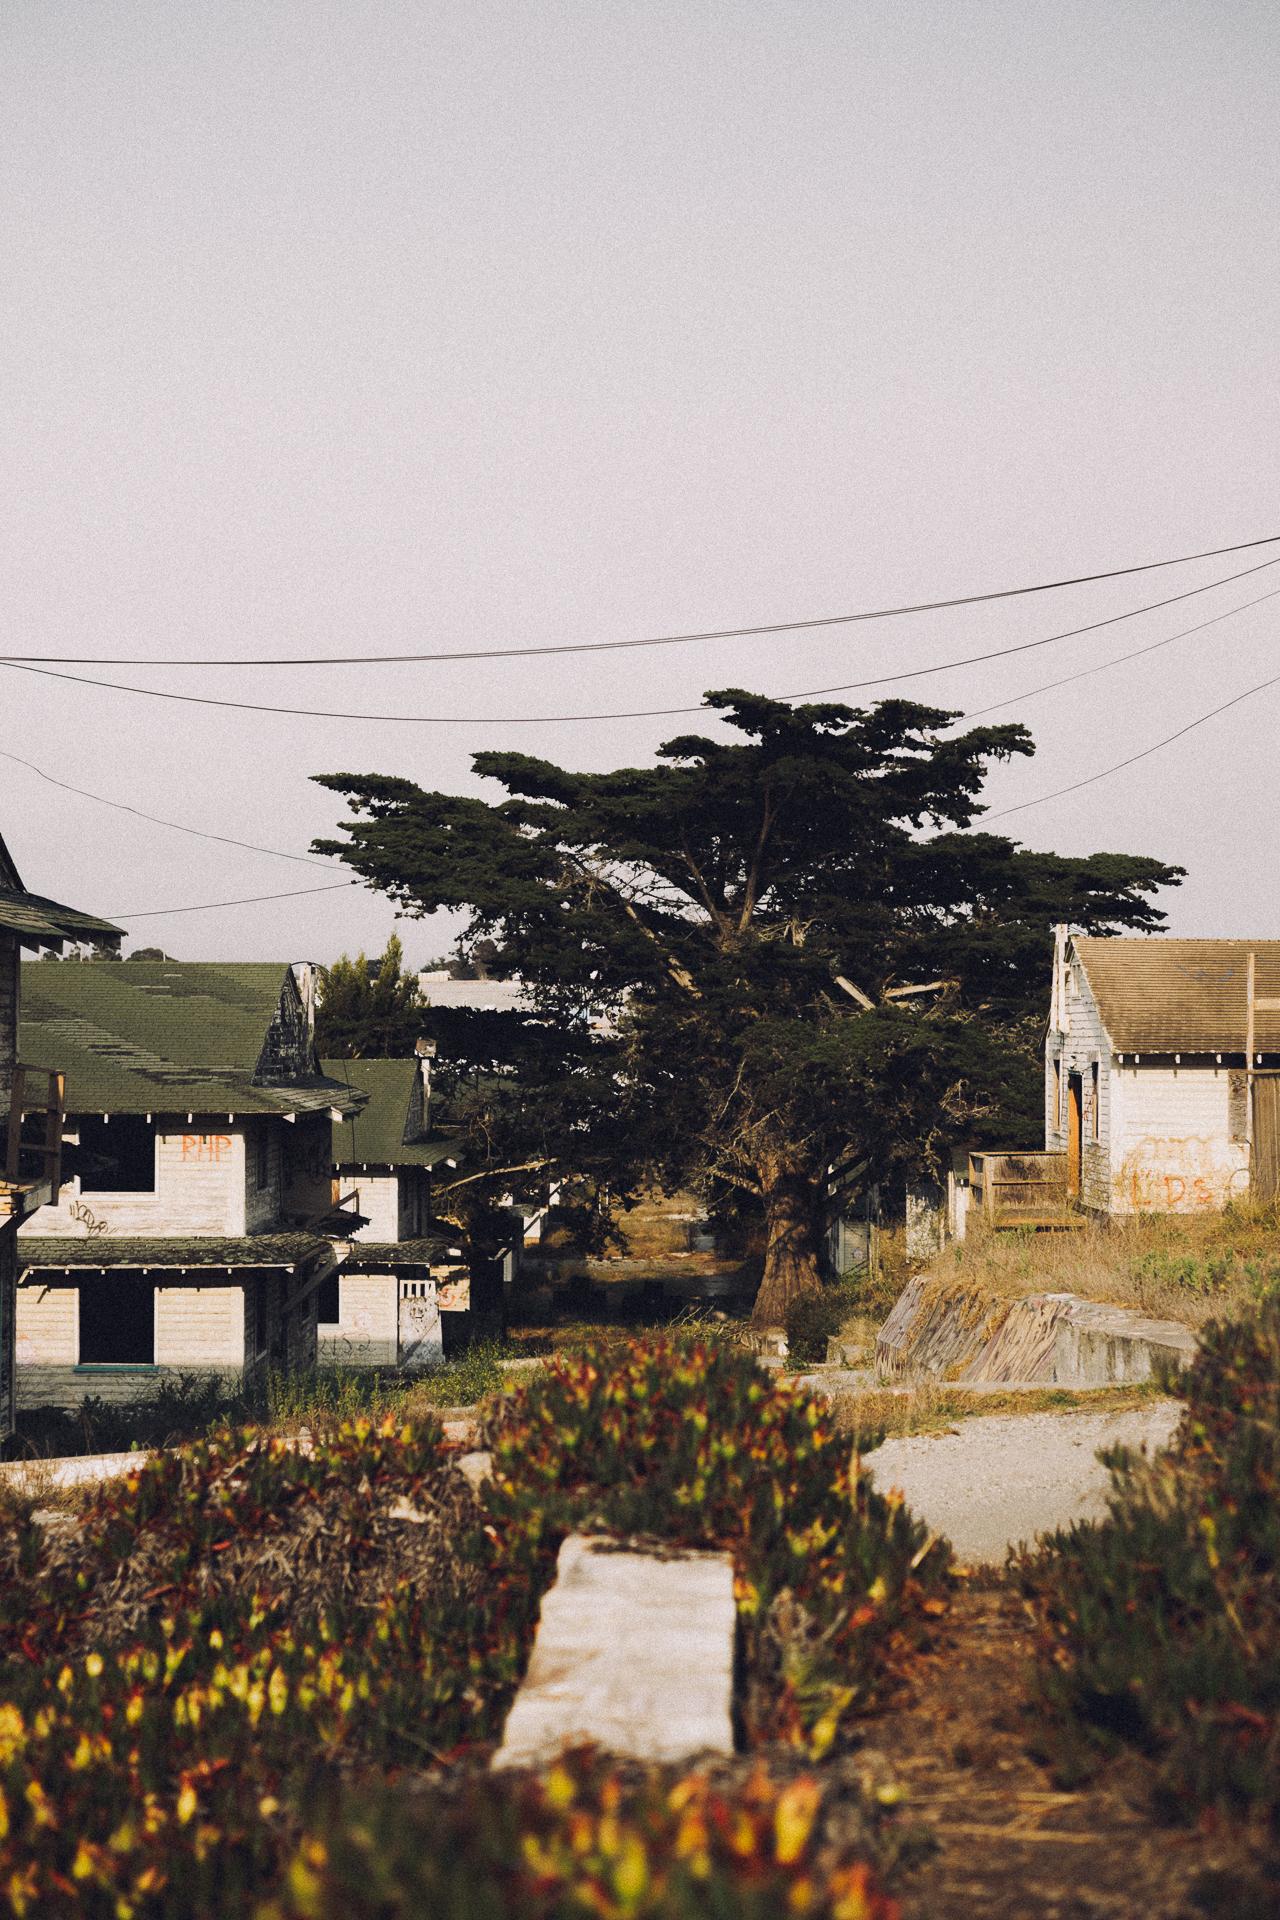 Blocks and blocks of barracks